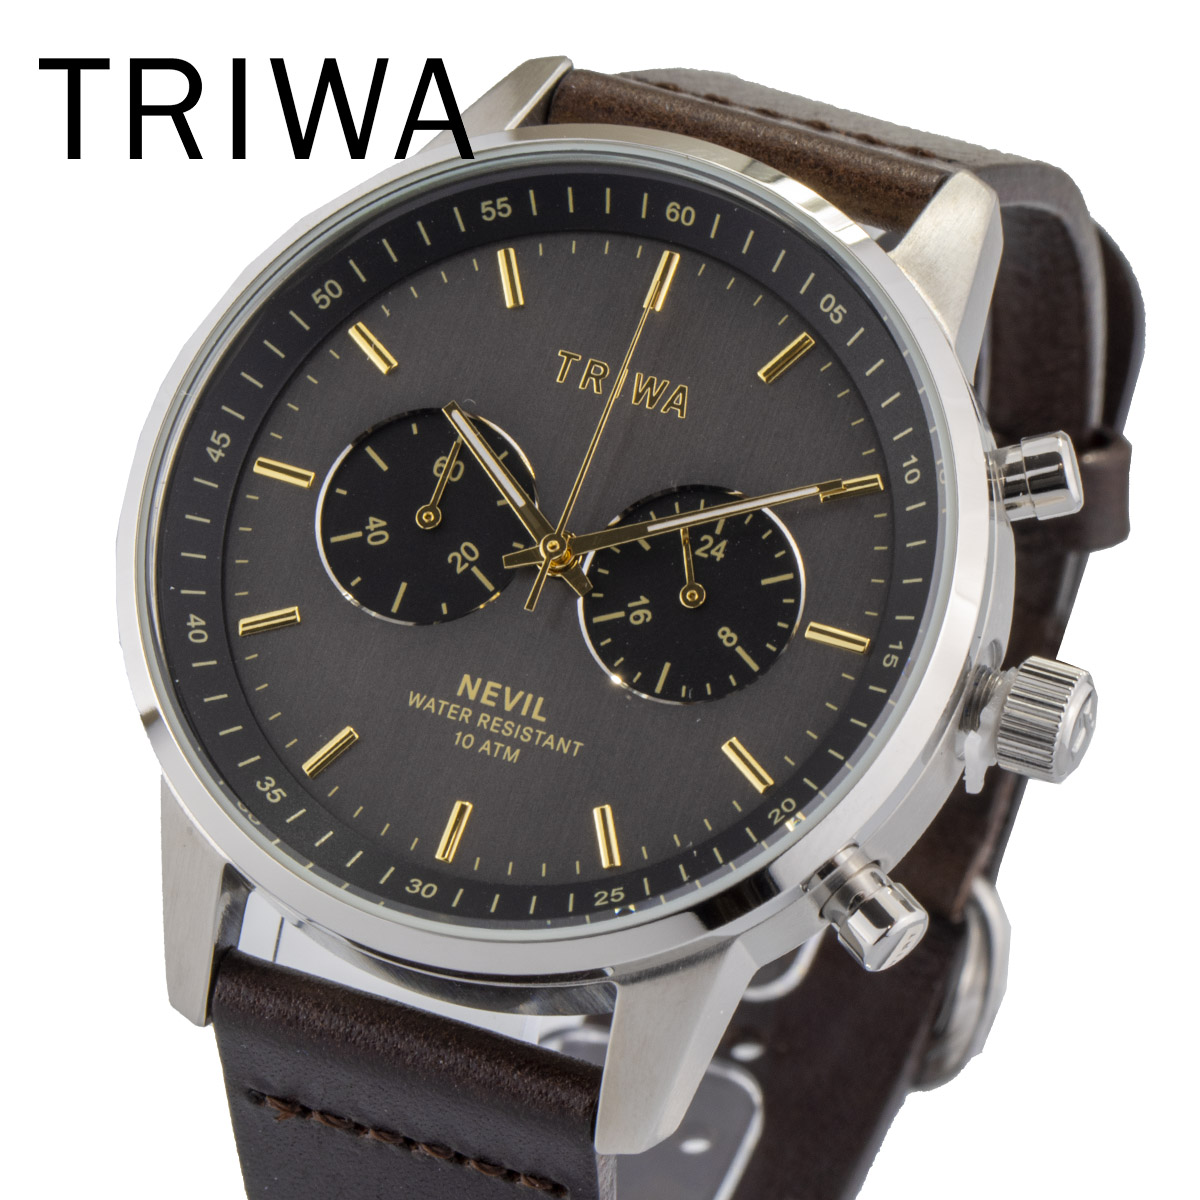 TRIWA トリワ NEST114 CL010412 SMOKY NEVIL メンズ レディース ユニセックス 時計 腕時計 プレゼント 贈り物 ギフト 彼氏 フォーマル カジュアル ペアウォッチ 北欧[あす楽]